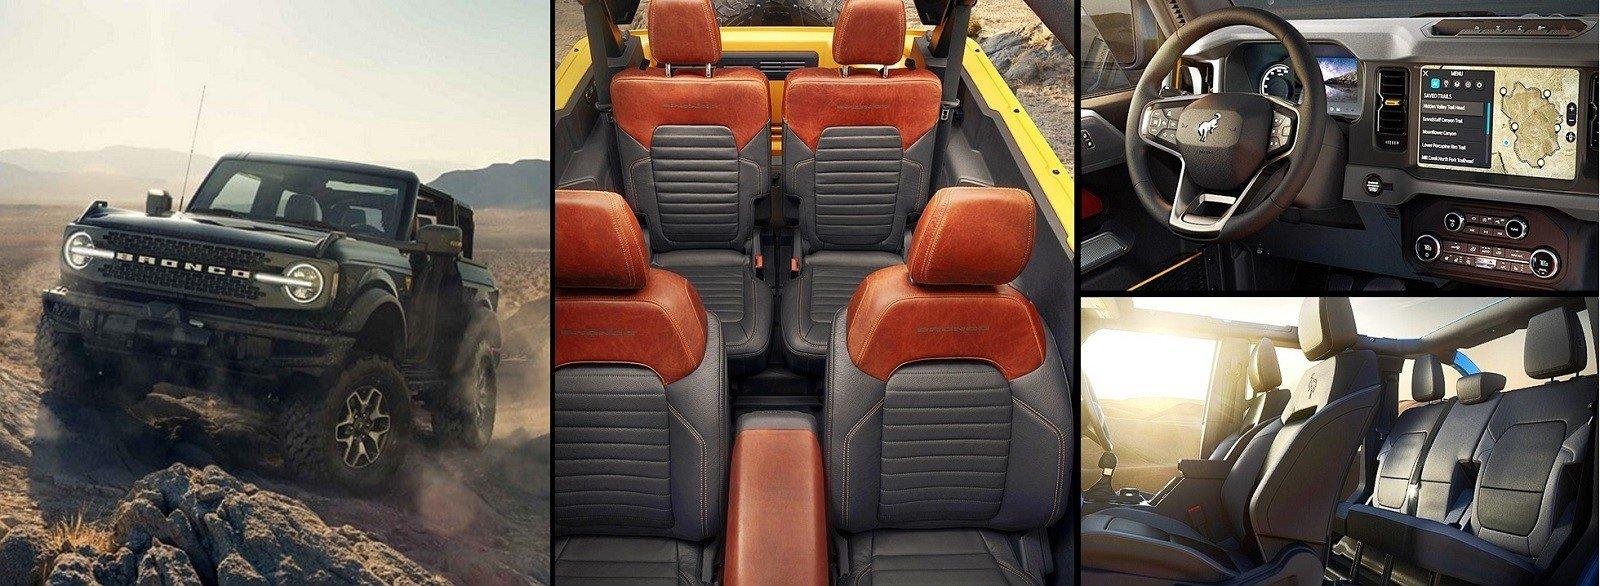 2021 Ford Bronco Interior and exterior design